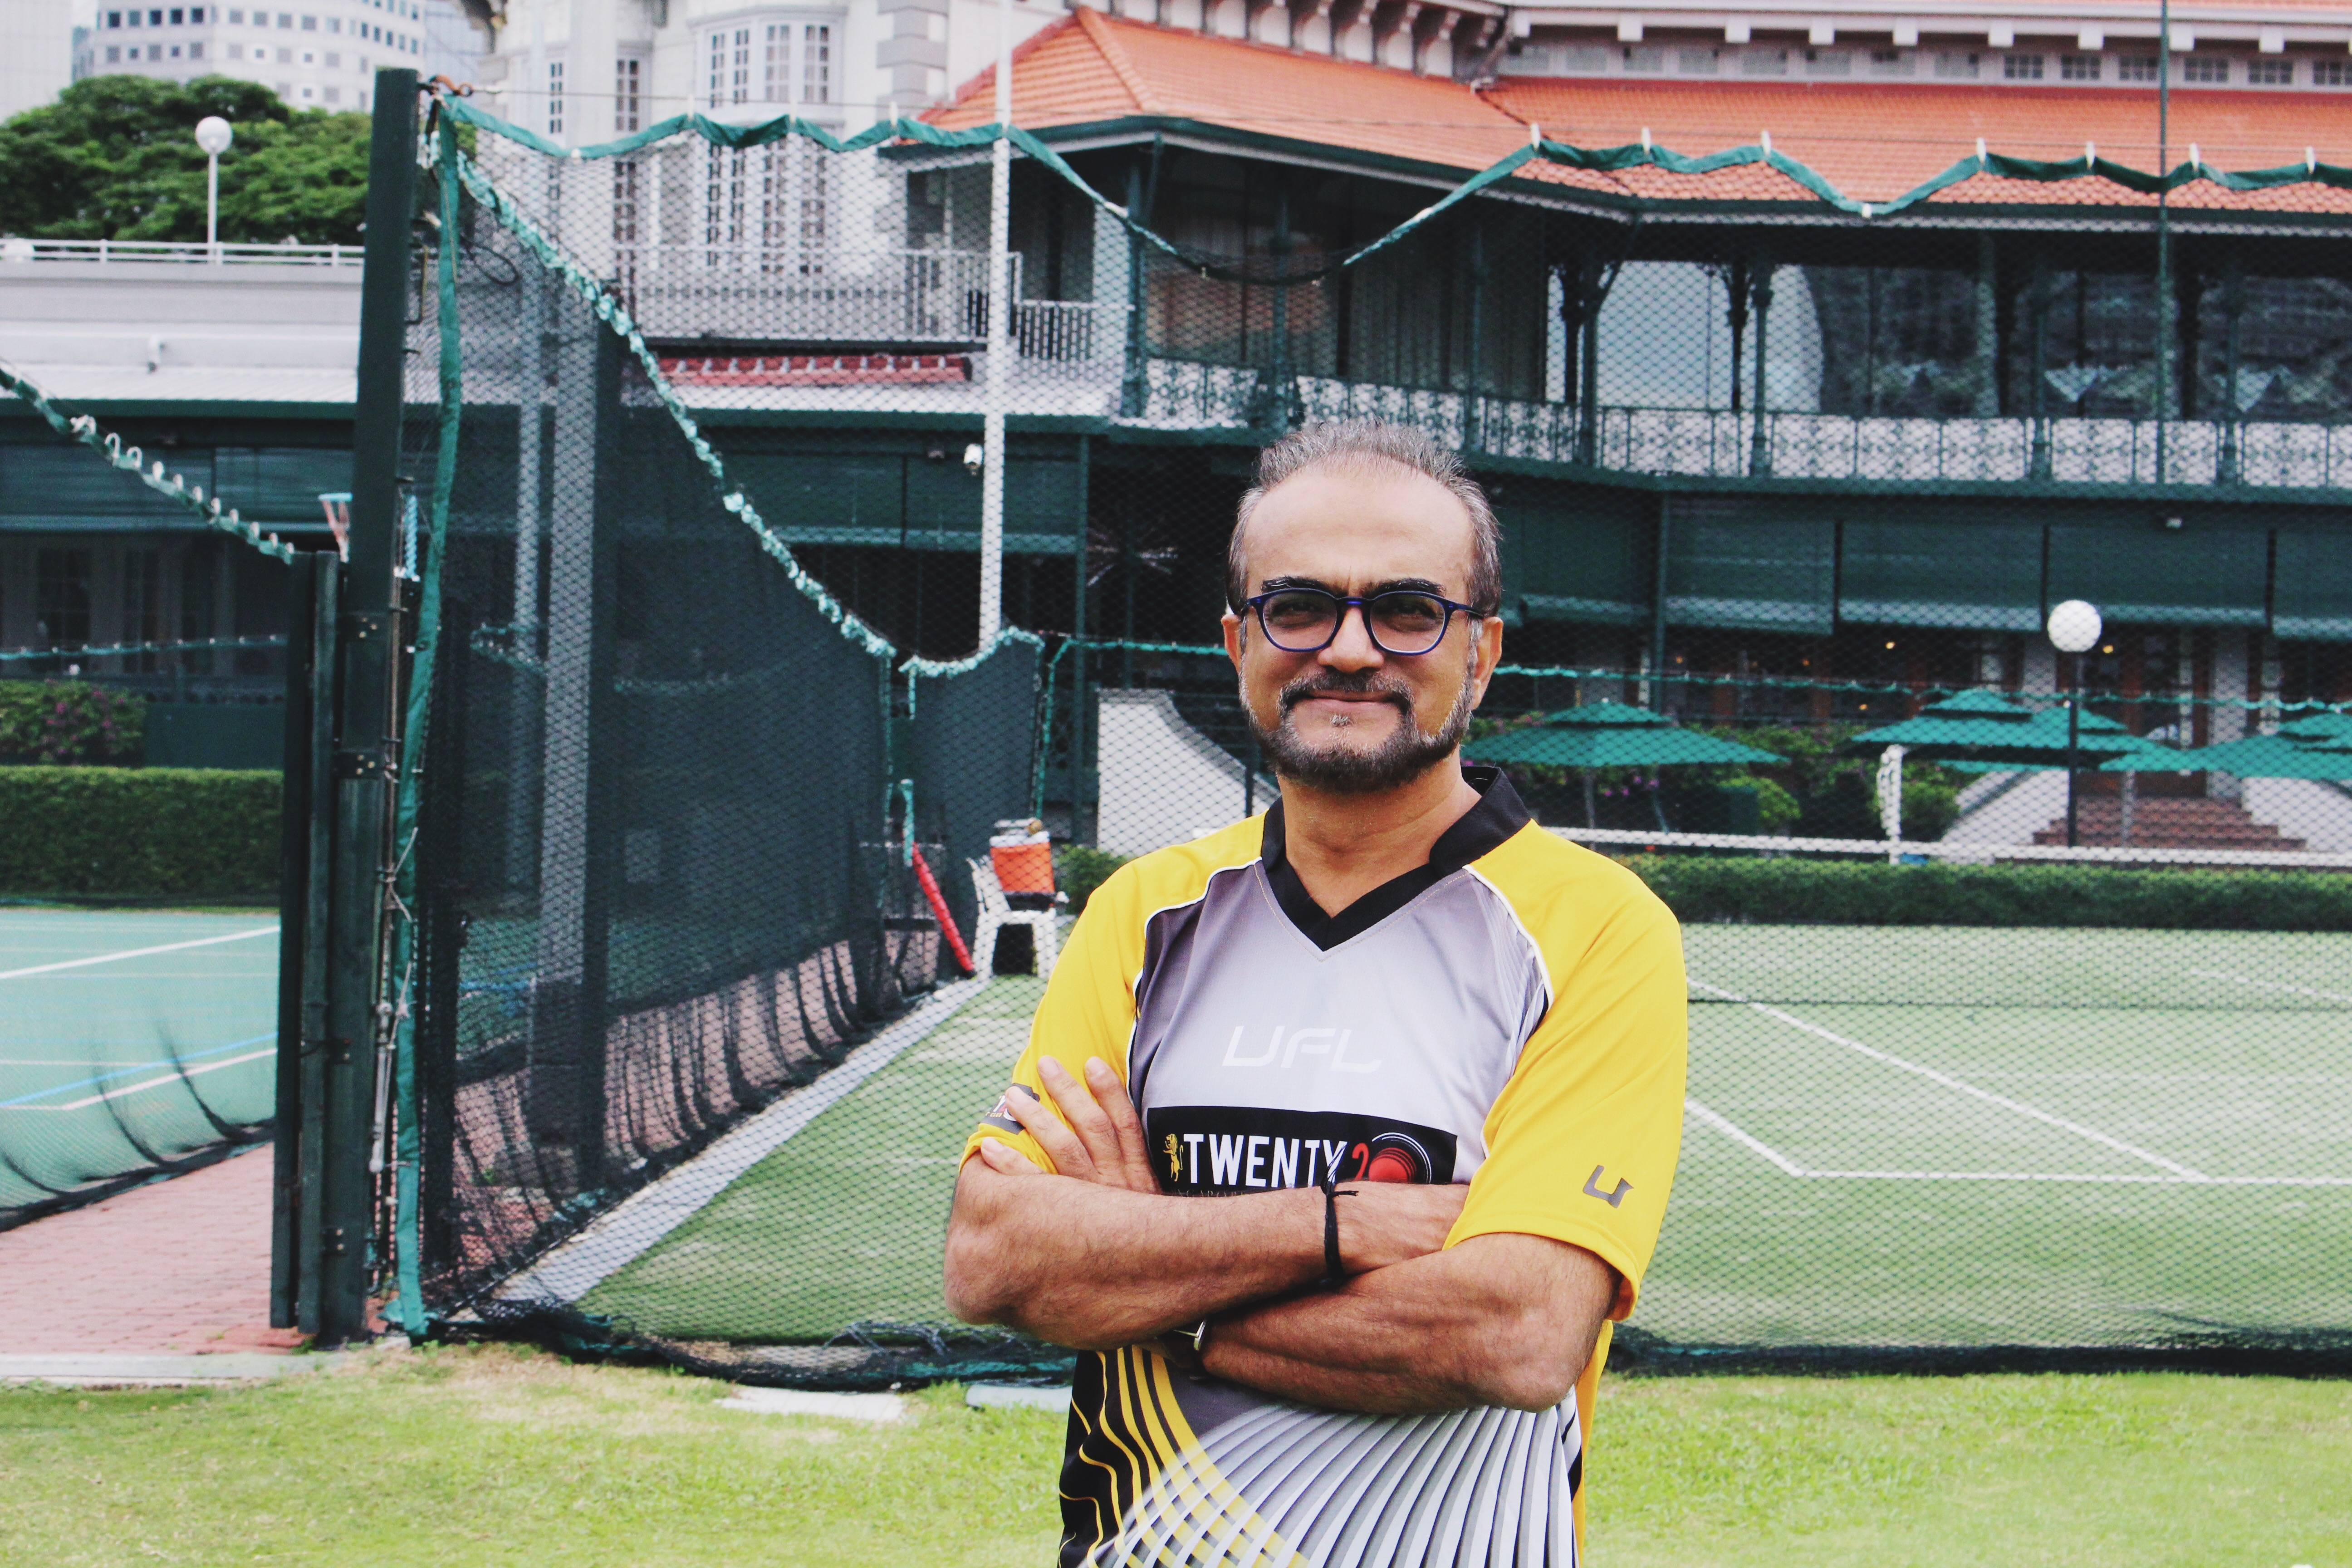 Ashok Mahtani at Singapore Cricket Club. Photo: Connected to India